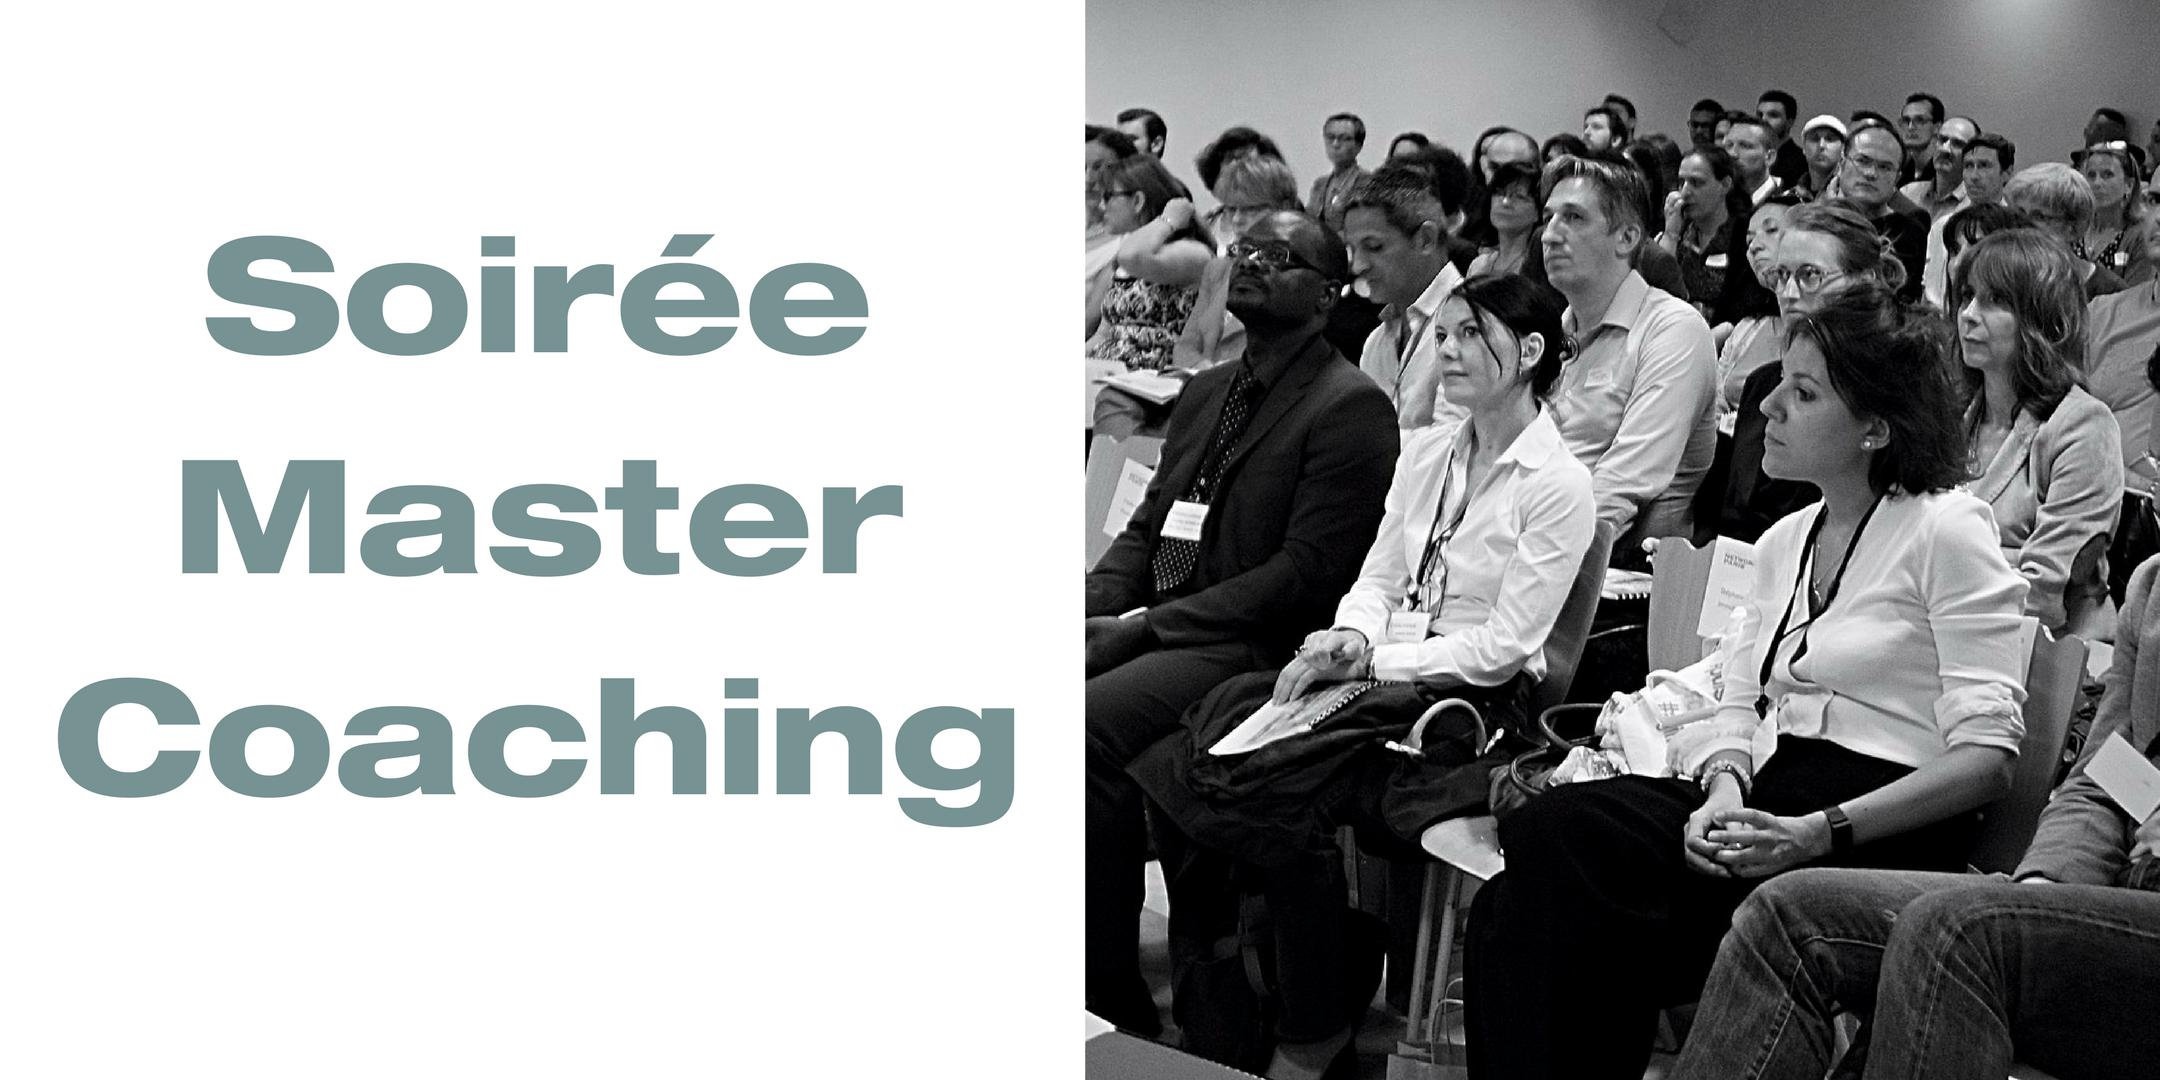 Soirée Master Coaching - 16 juin 2017